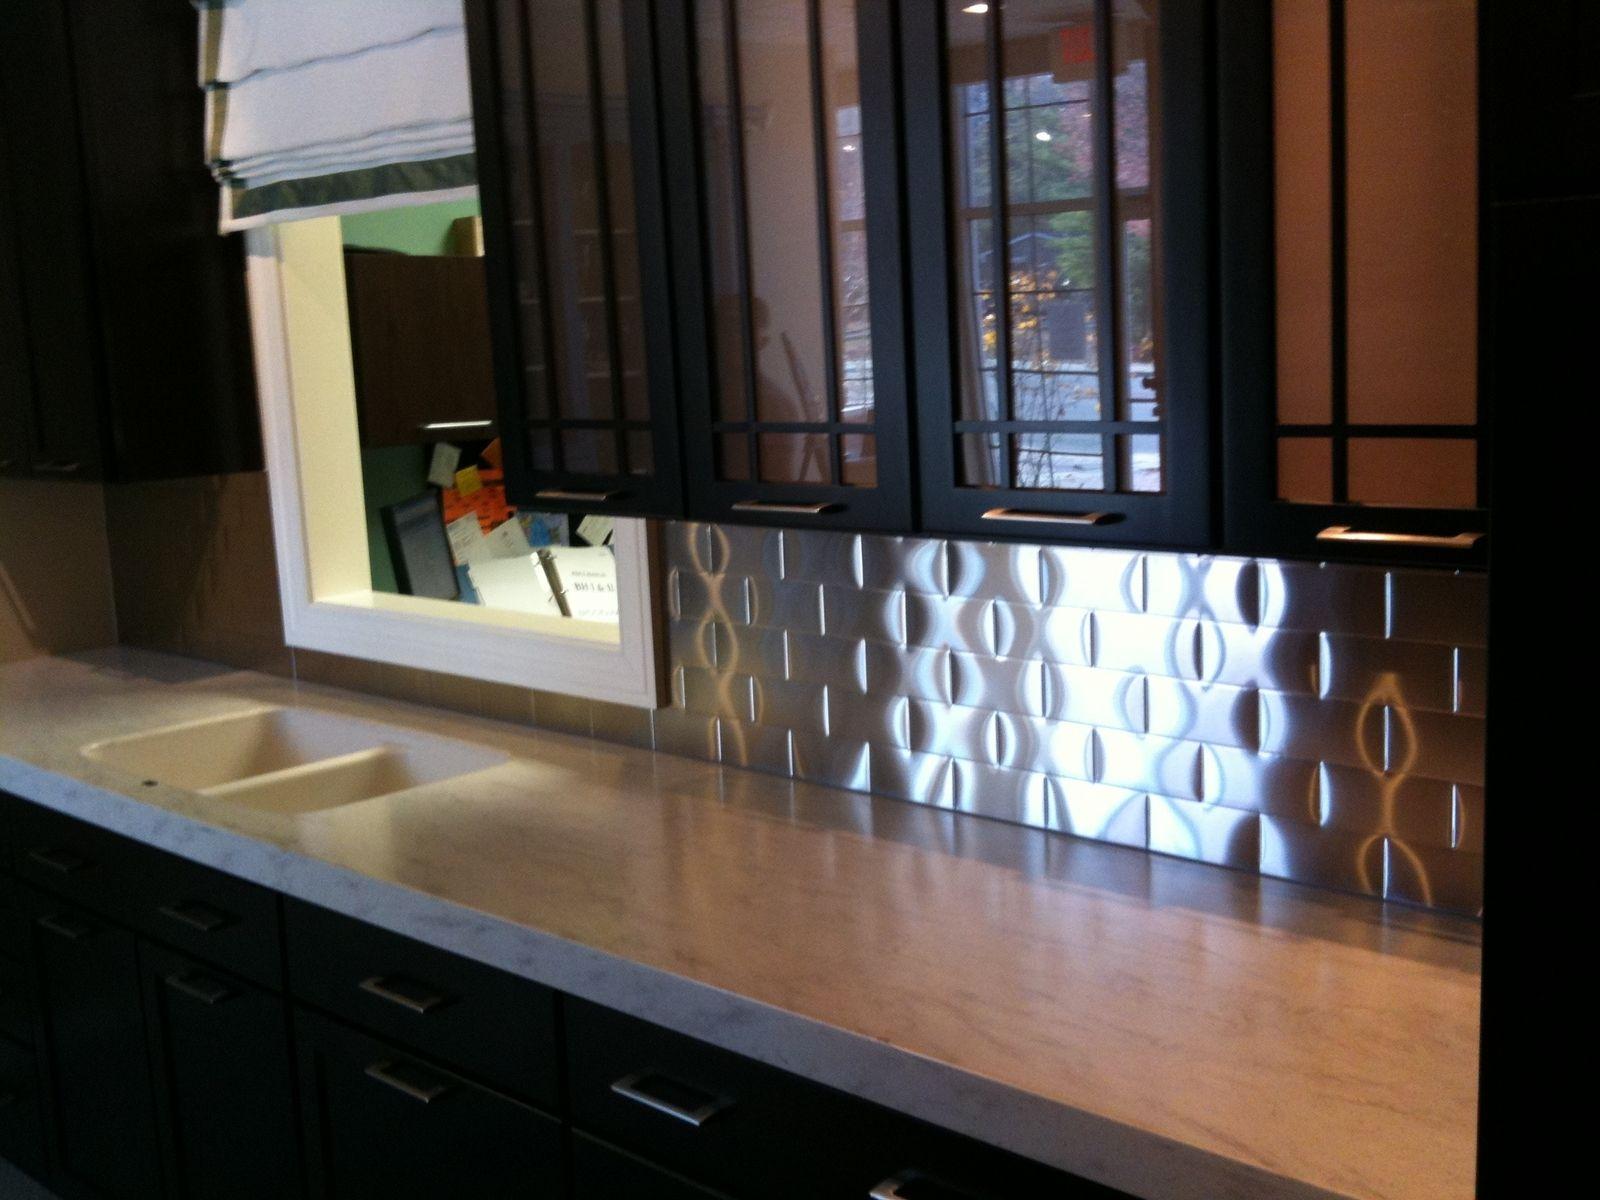 Sweet kitchen splashback made of stainless steel